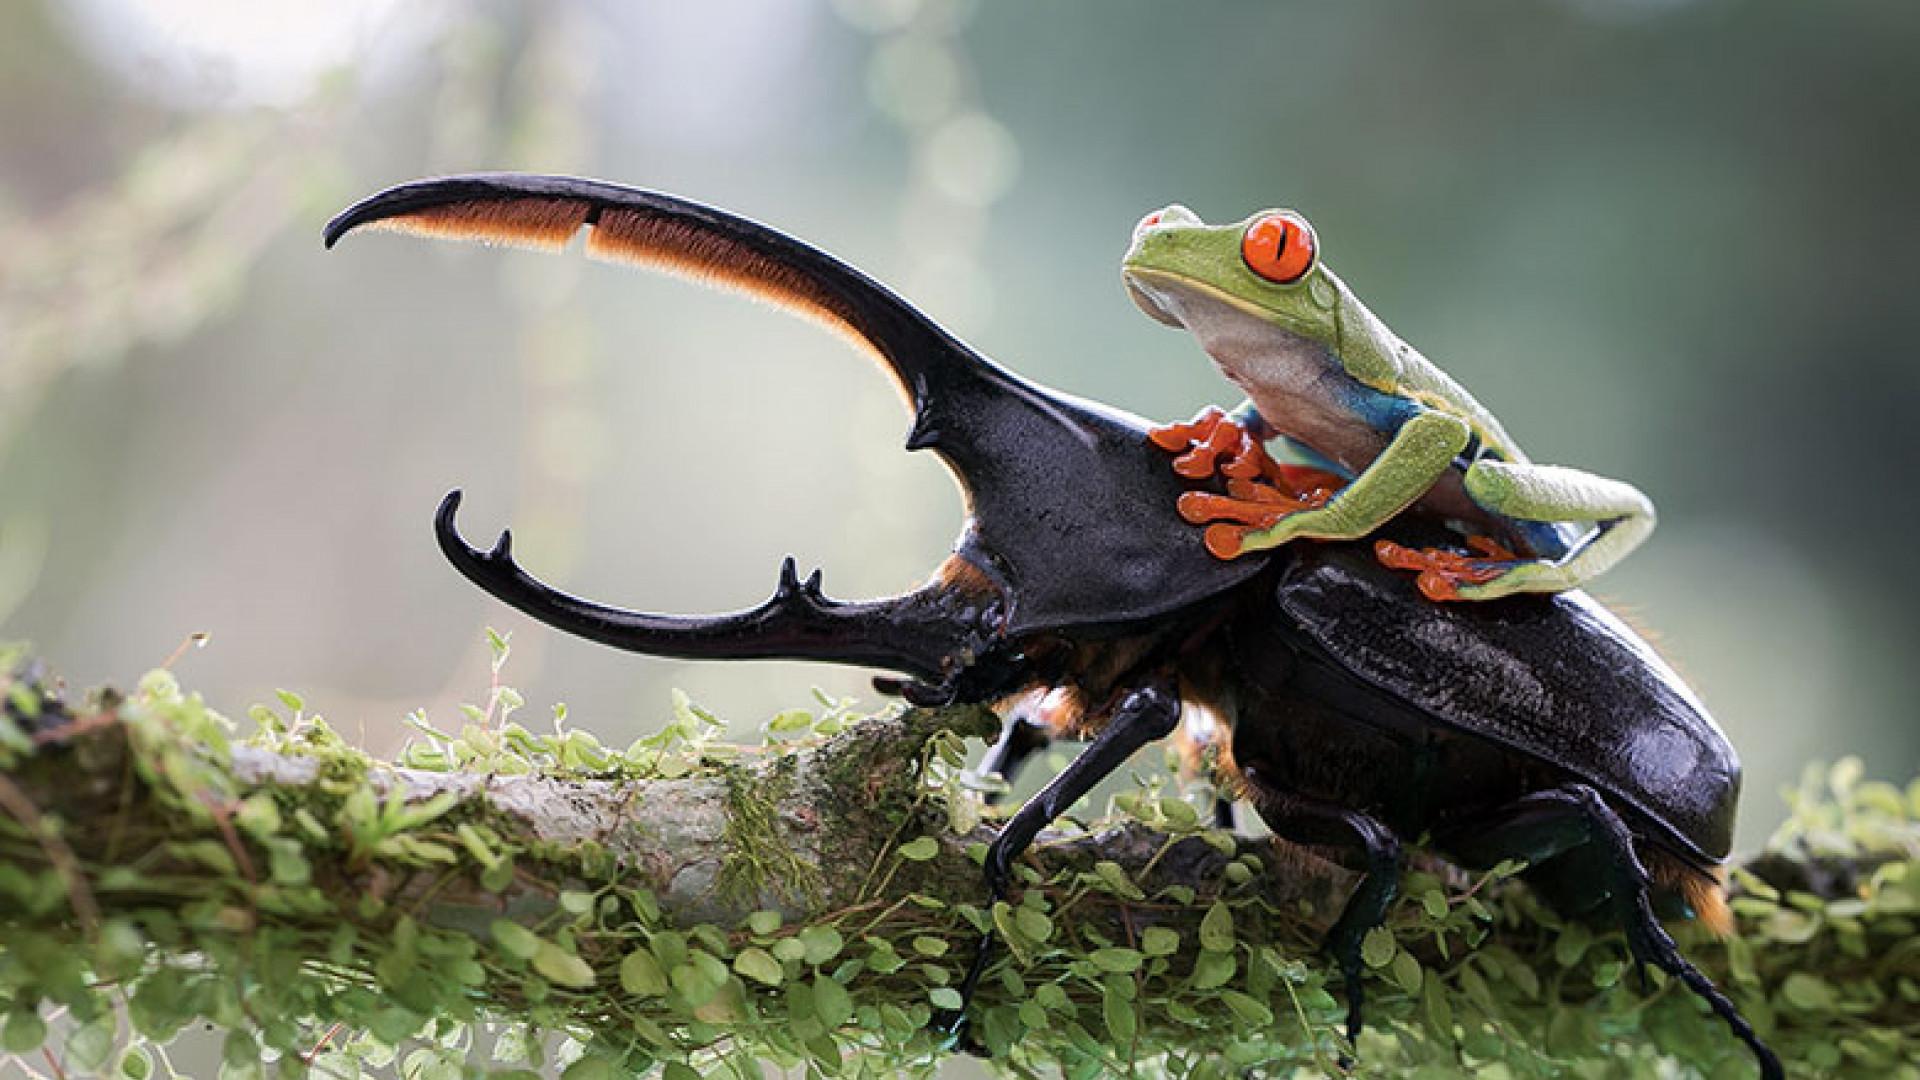 Nicolas_Reusens_Boden,_Sweden,_Entry,_Open_Nature_&_Wildlife,_2014_Sony_World_Photography_Awards.jpg_cmyk1